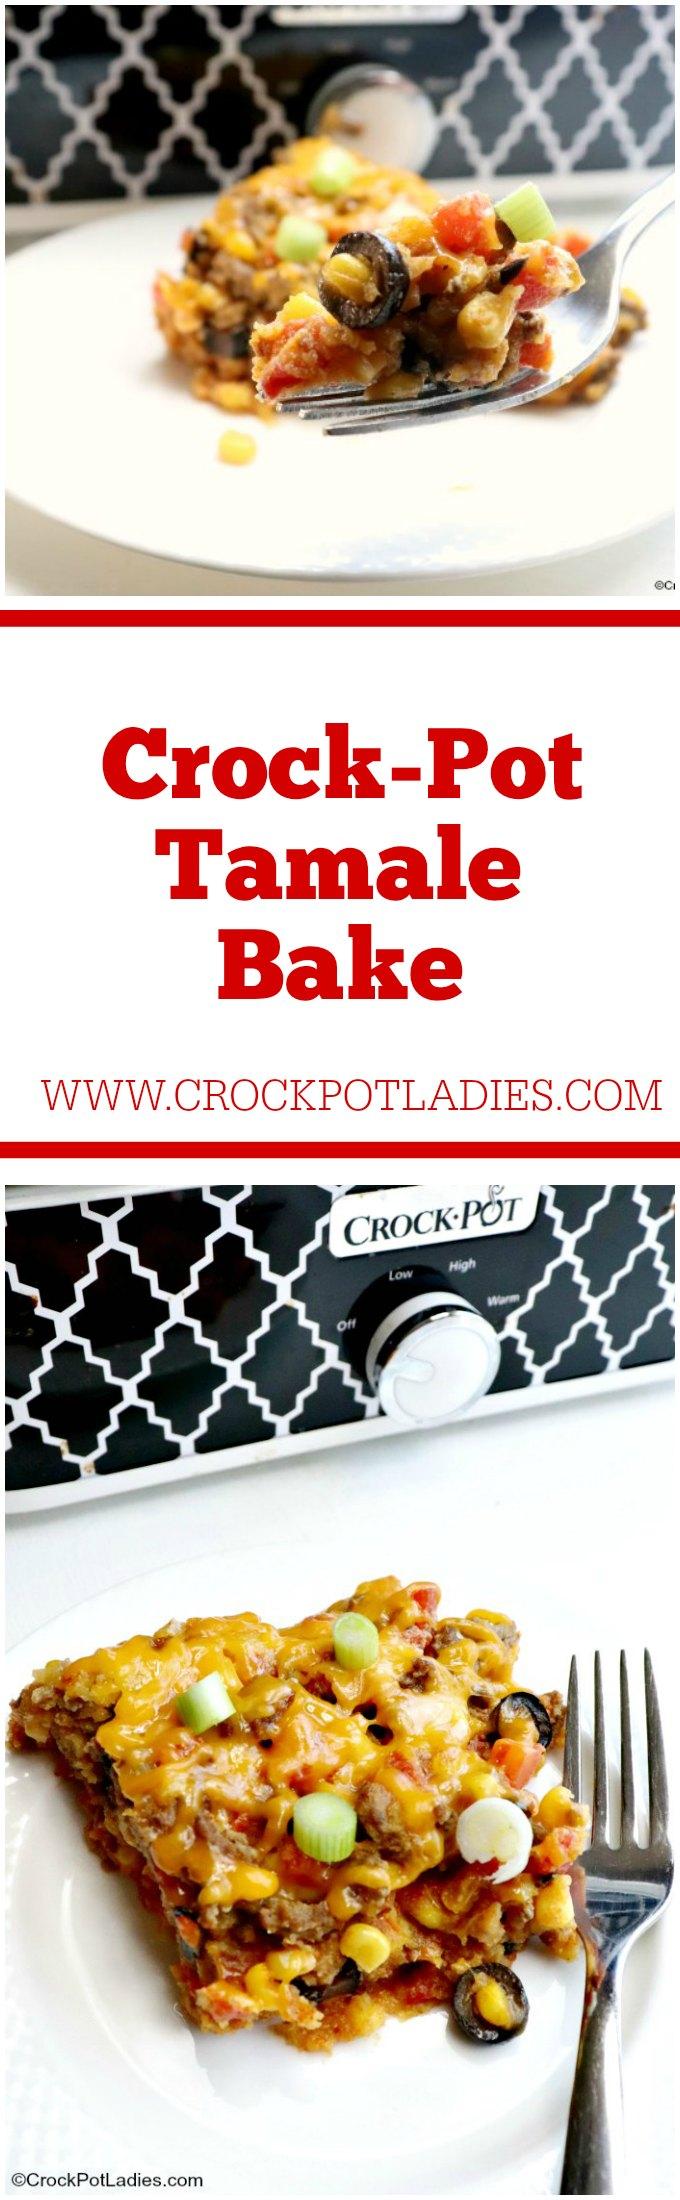 Crock-Pot Tamale Bake